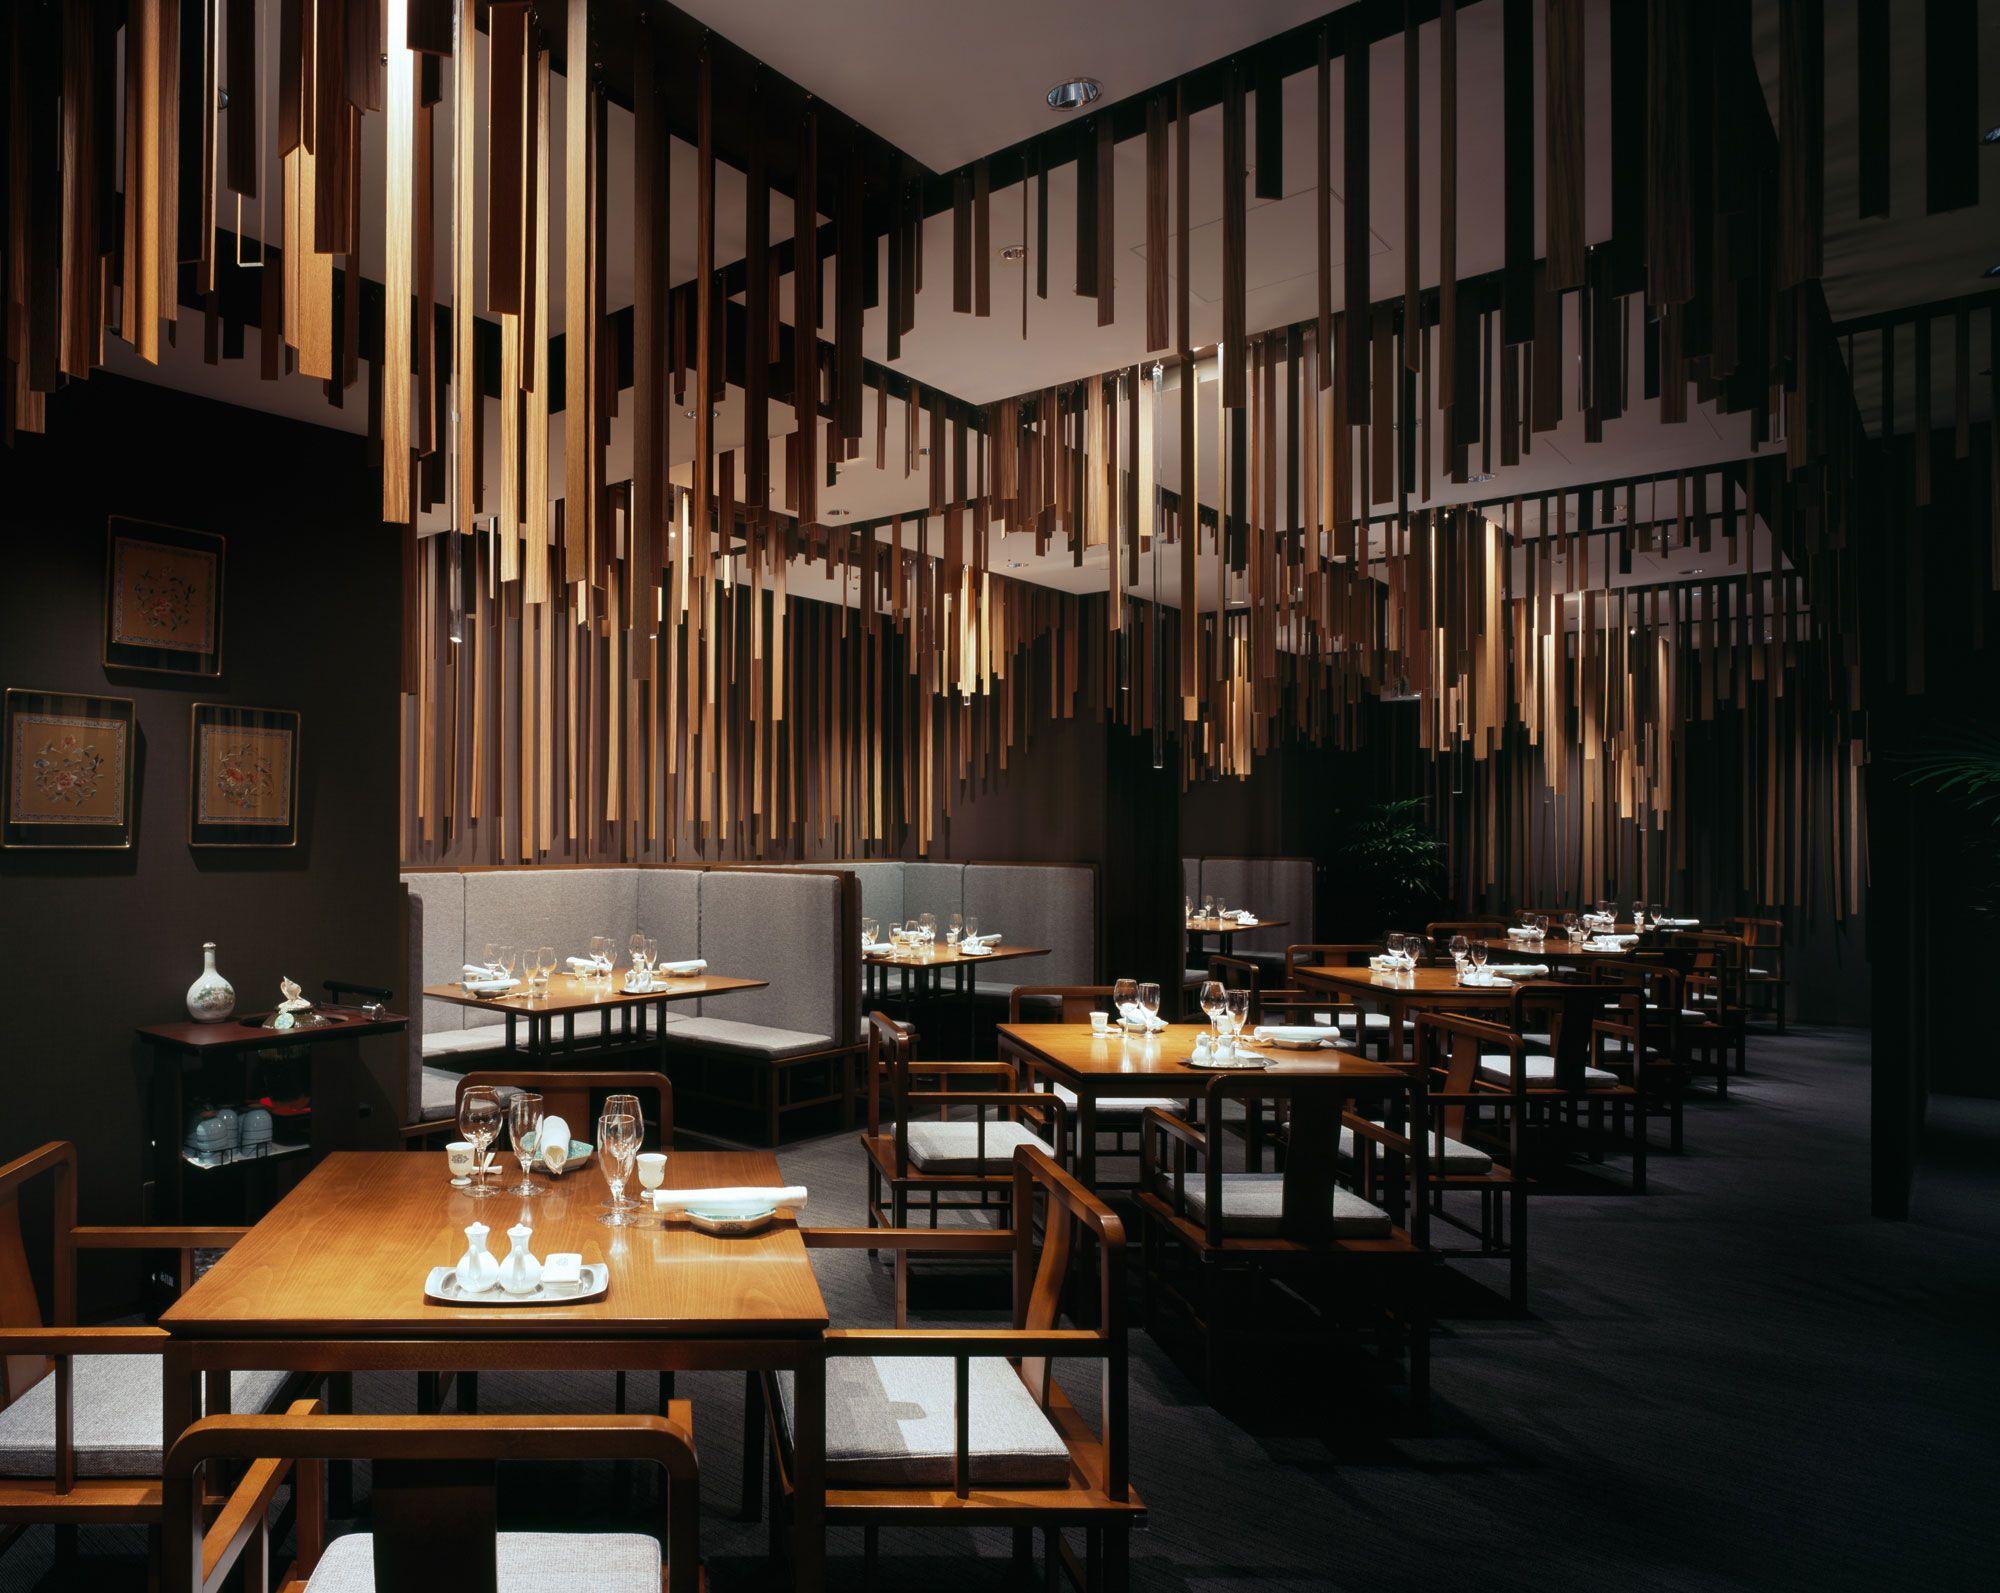 Shato hanten id restaurants pinterest restaurant design modern restaurant and for Modern restaurant interior design